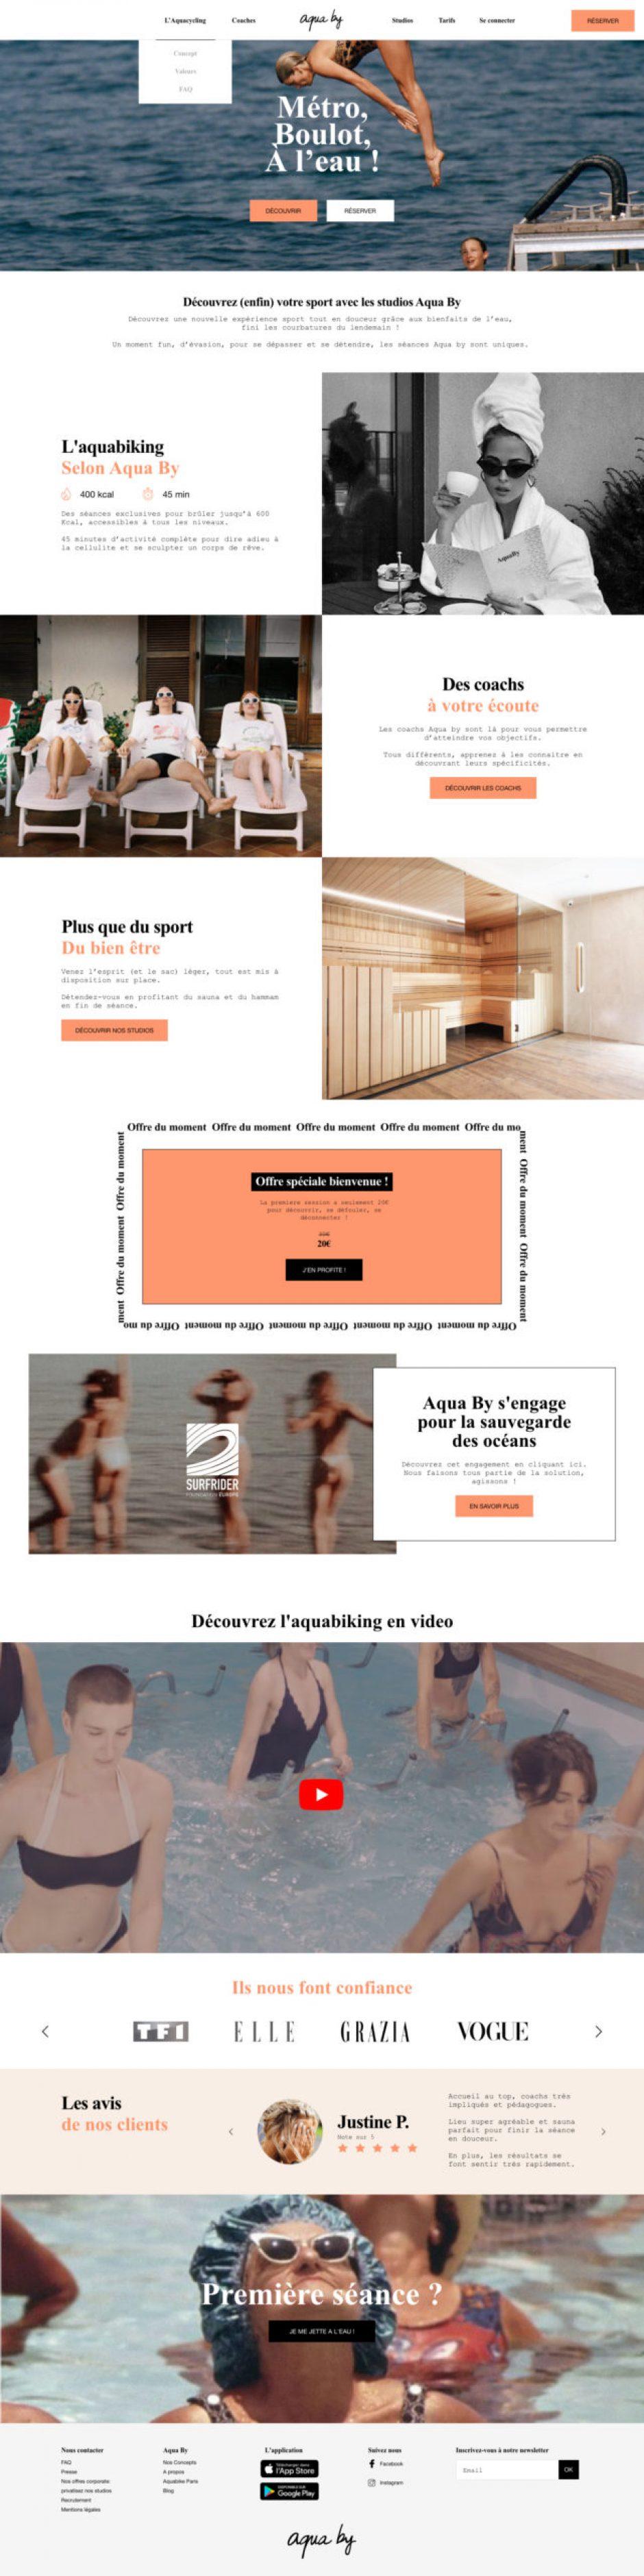 Création site internet WordPress - MD Webdesigner Paris